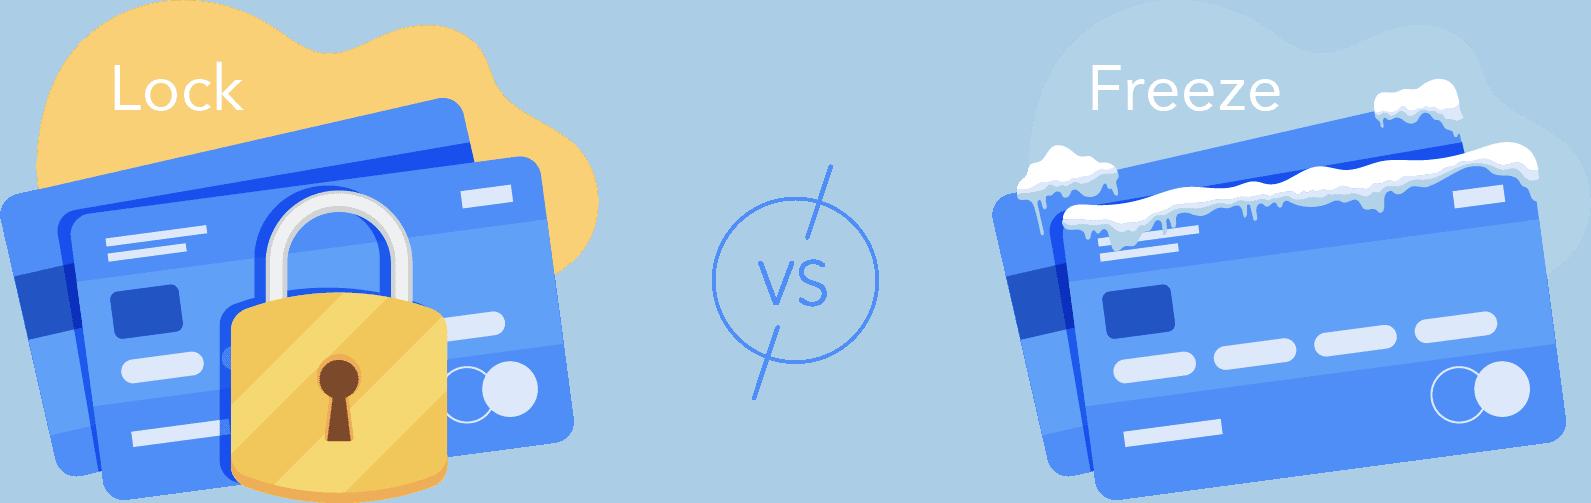 Credit Locking vs Credit Freezing